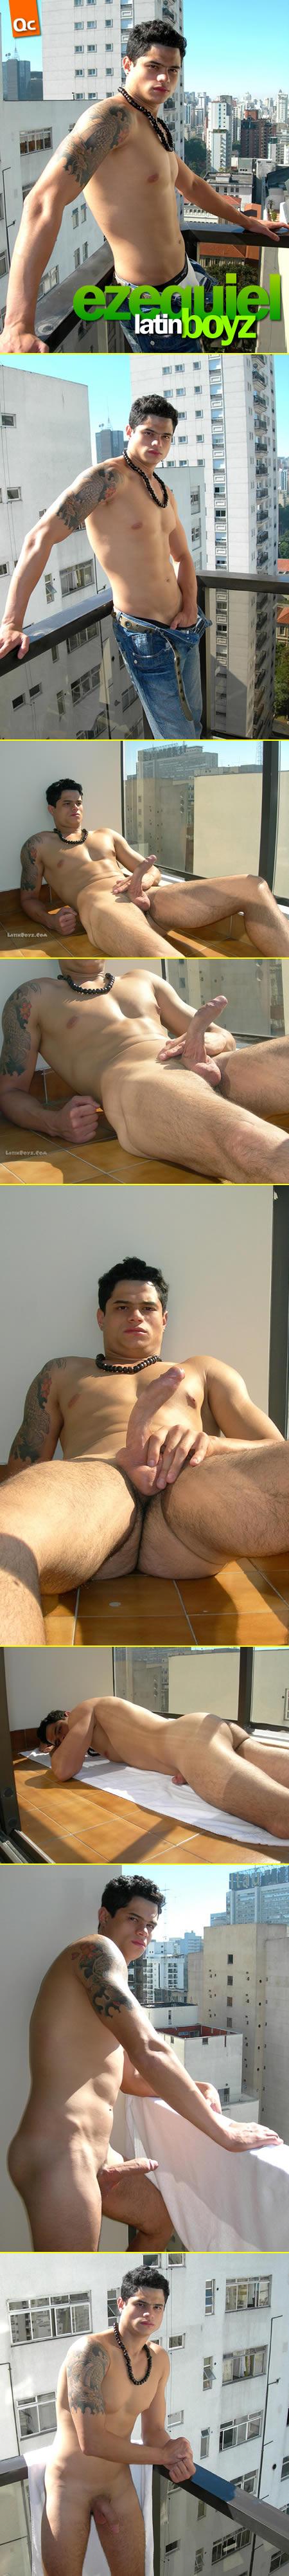 Latin Boyz: Ezequiel